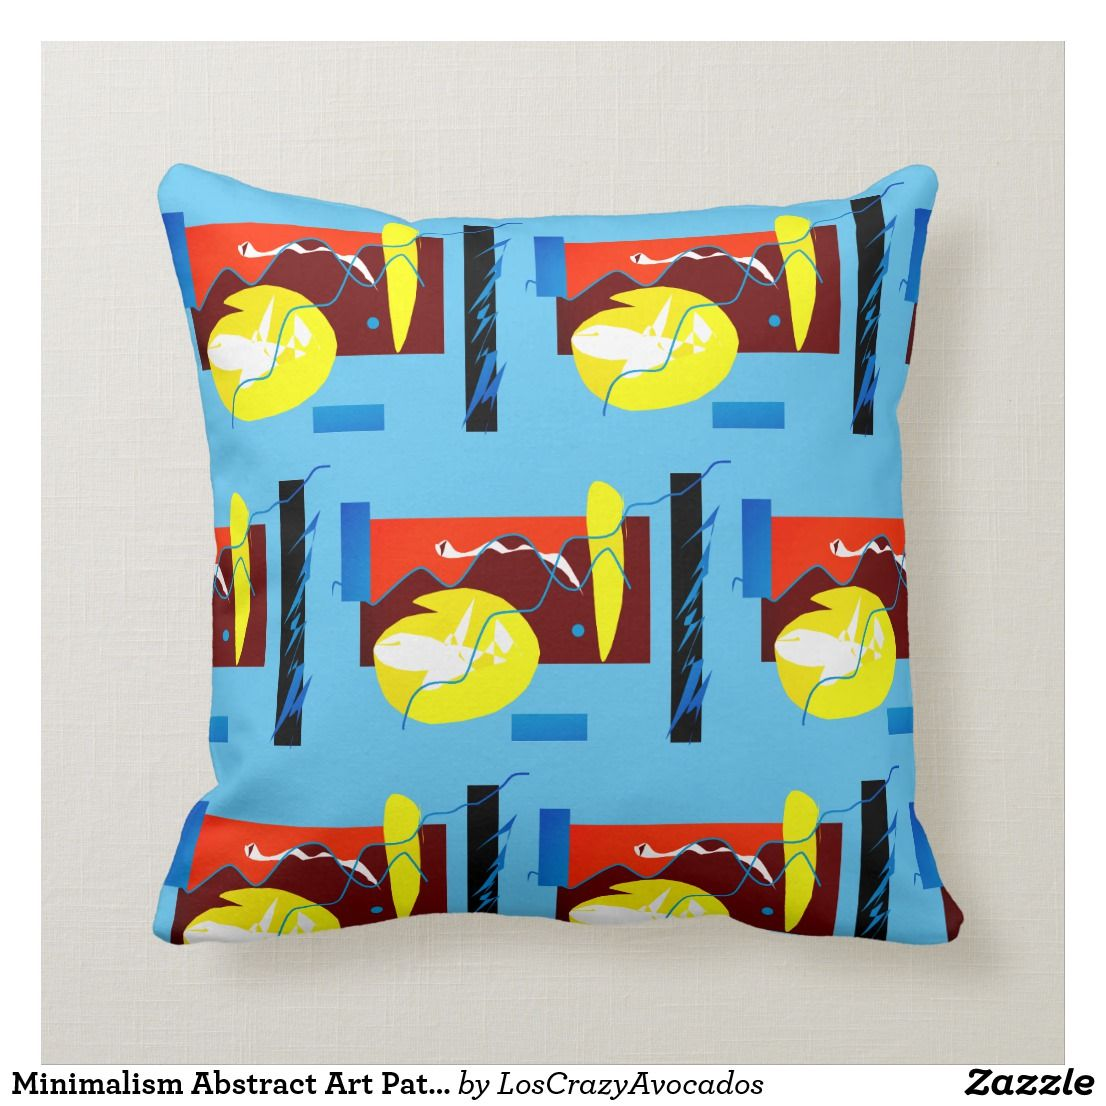 Minimalism Abstract Art Pattern Pillow Cushion Zazzle Com Pattern Art Pillow Cushion Pillow Pattern